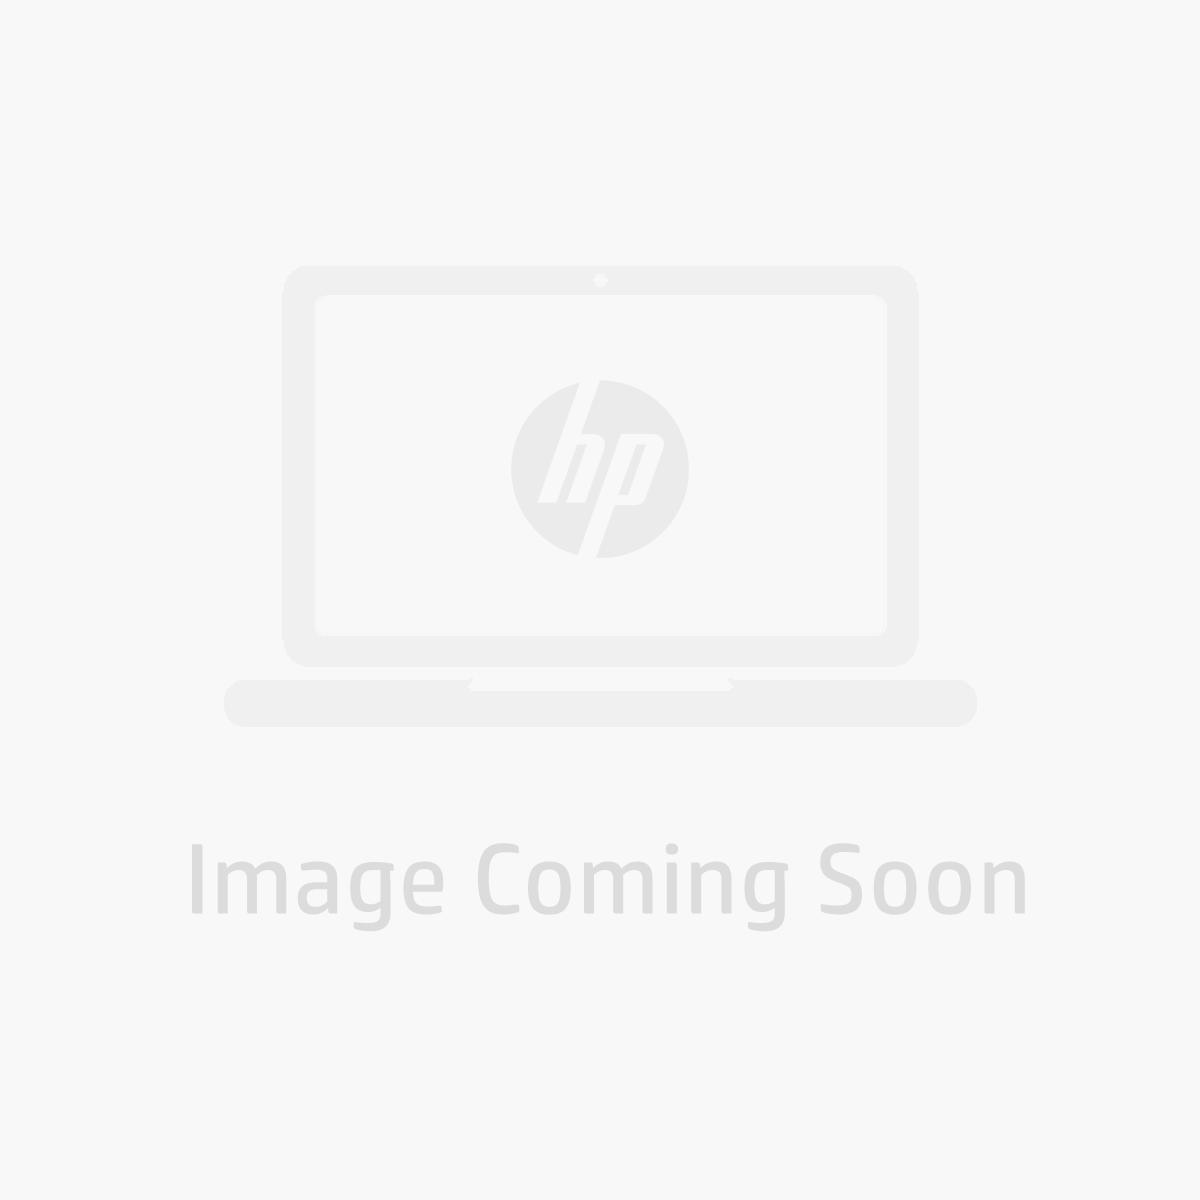 Volkano Port Series Display Port To HDMI Converter